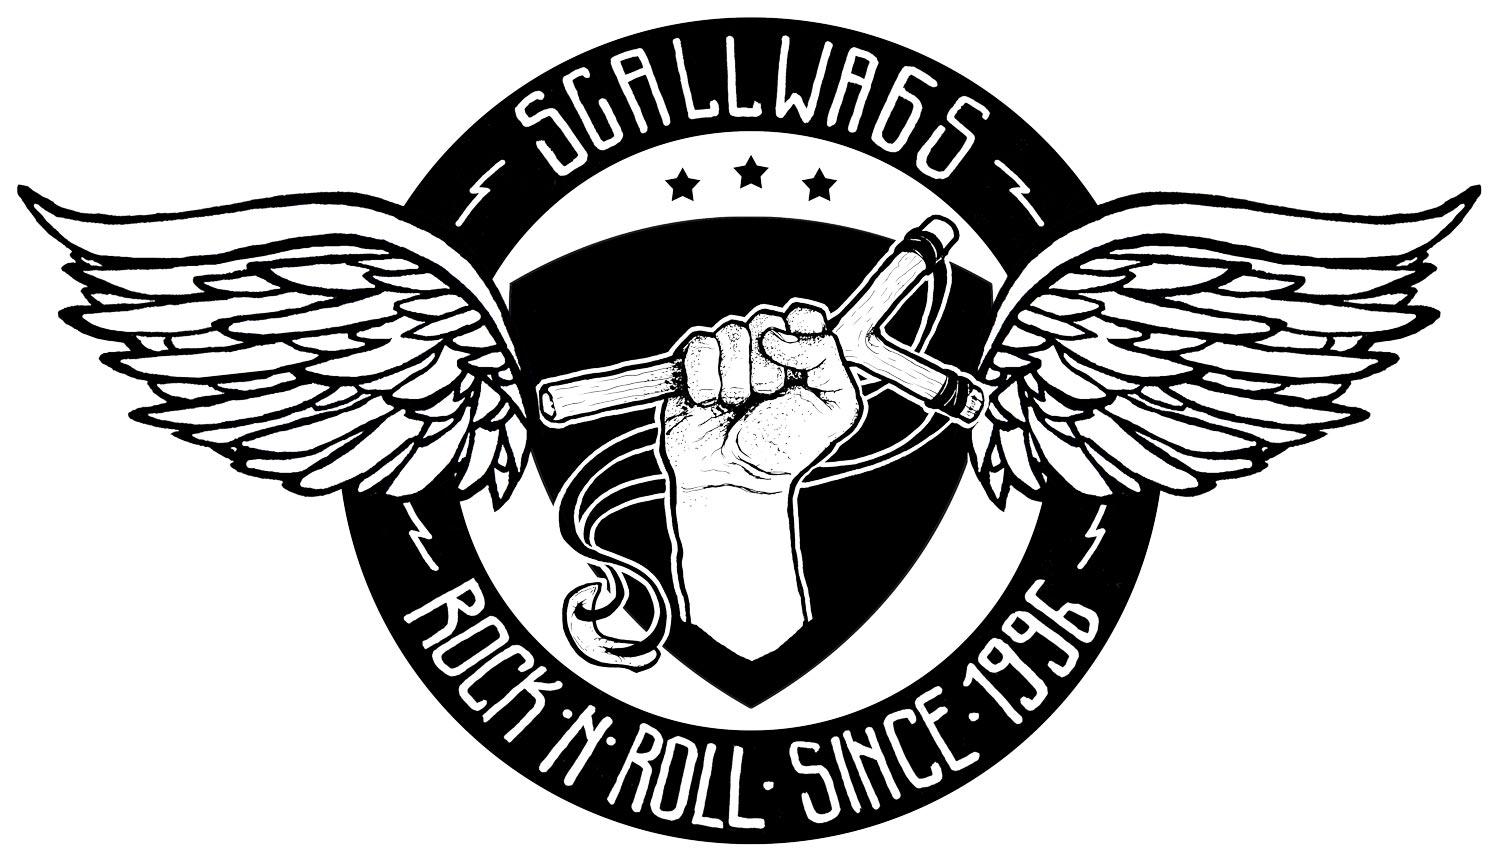 scallwags_final